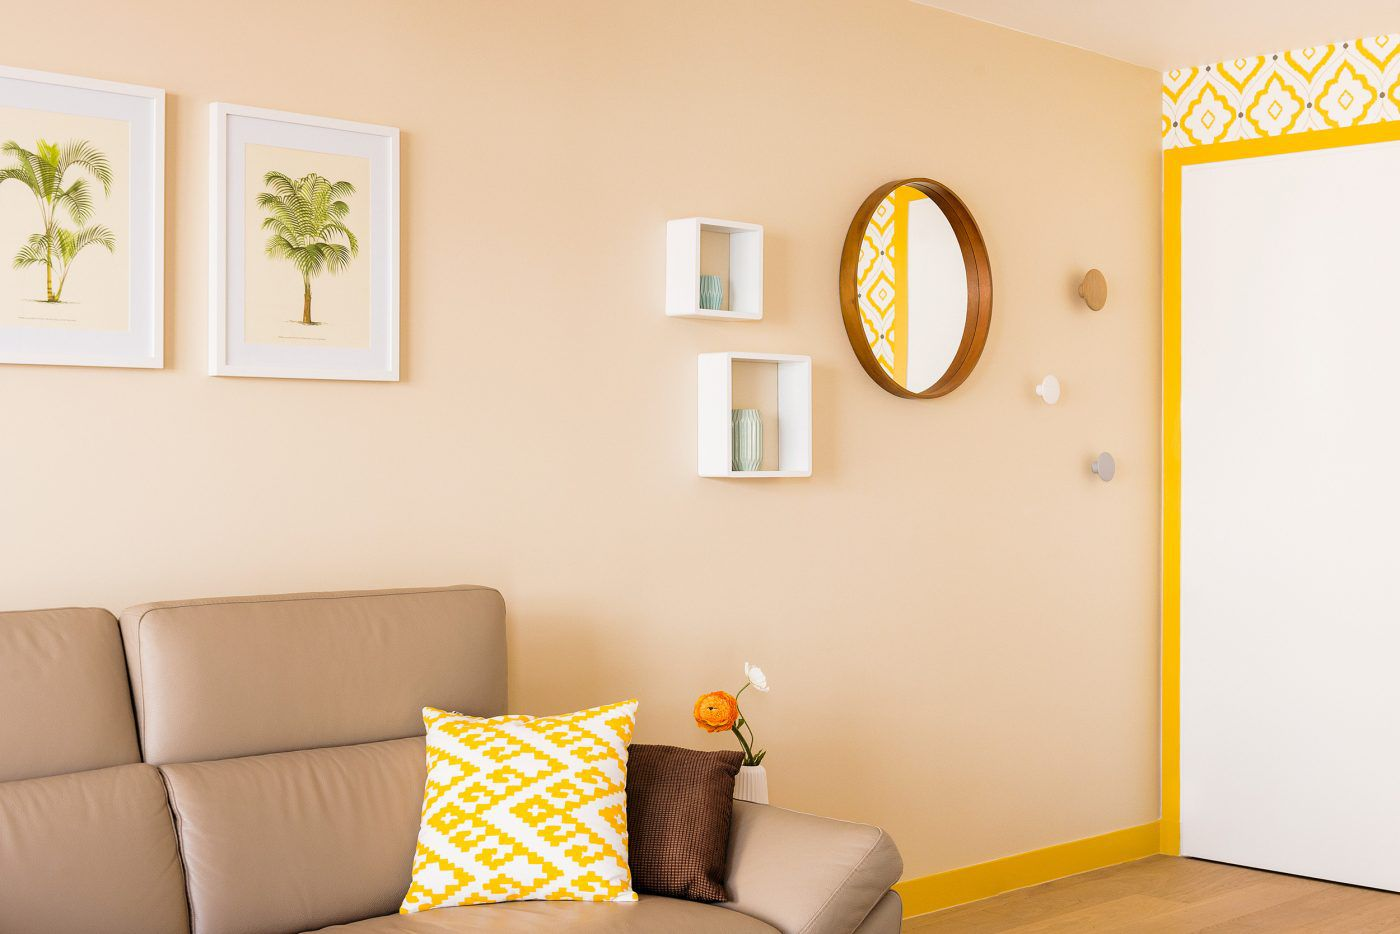 Warm Yellows and Creams color scheme